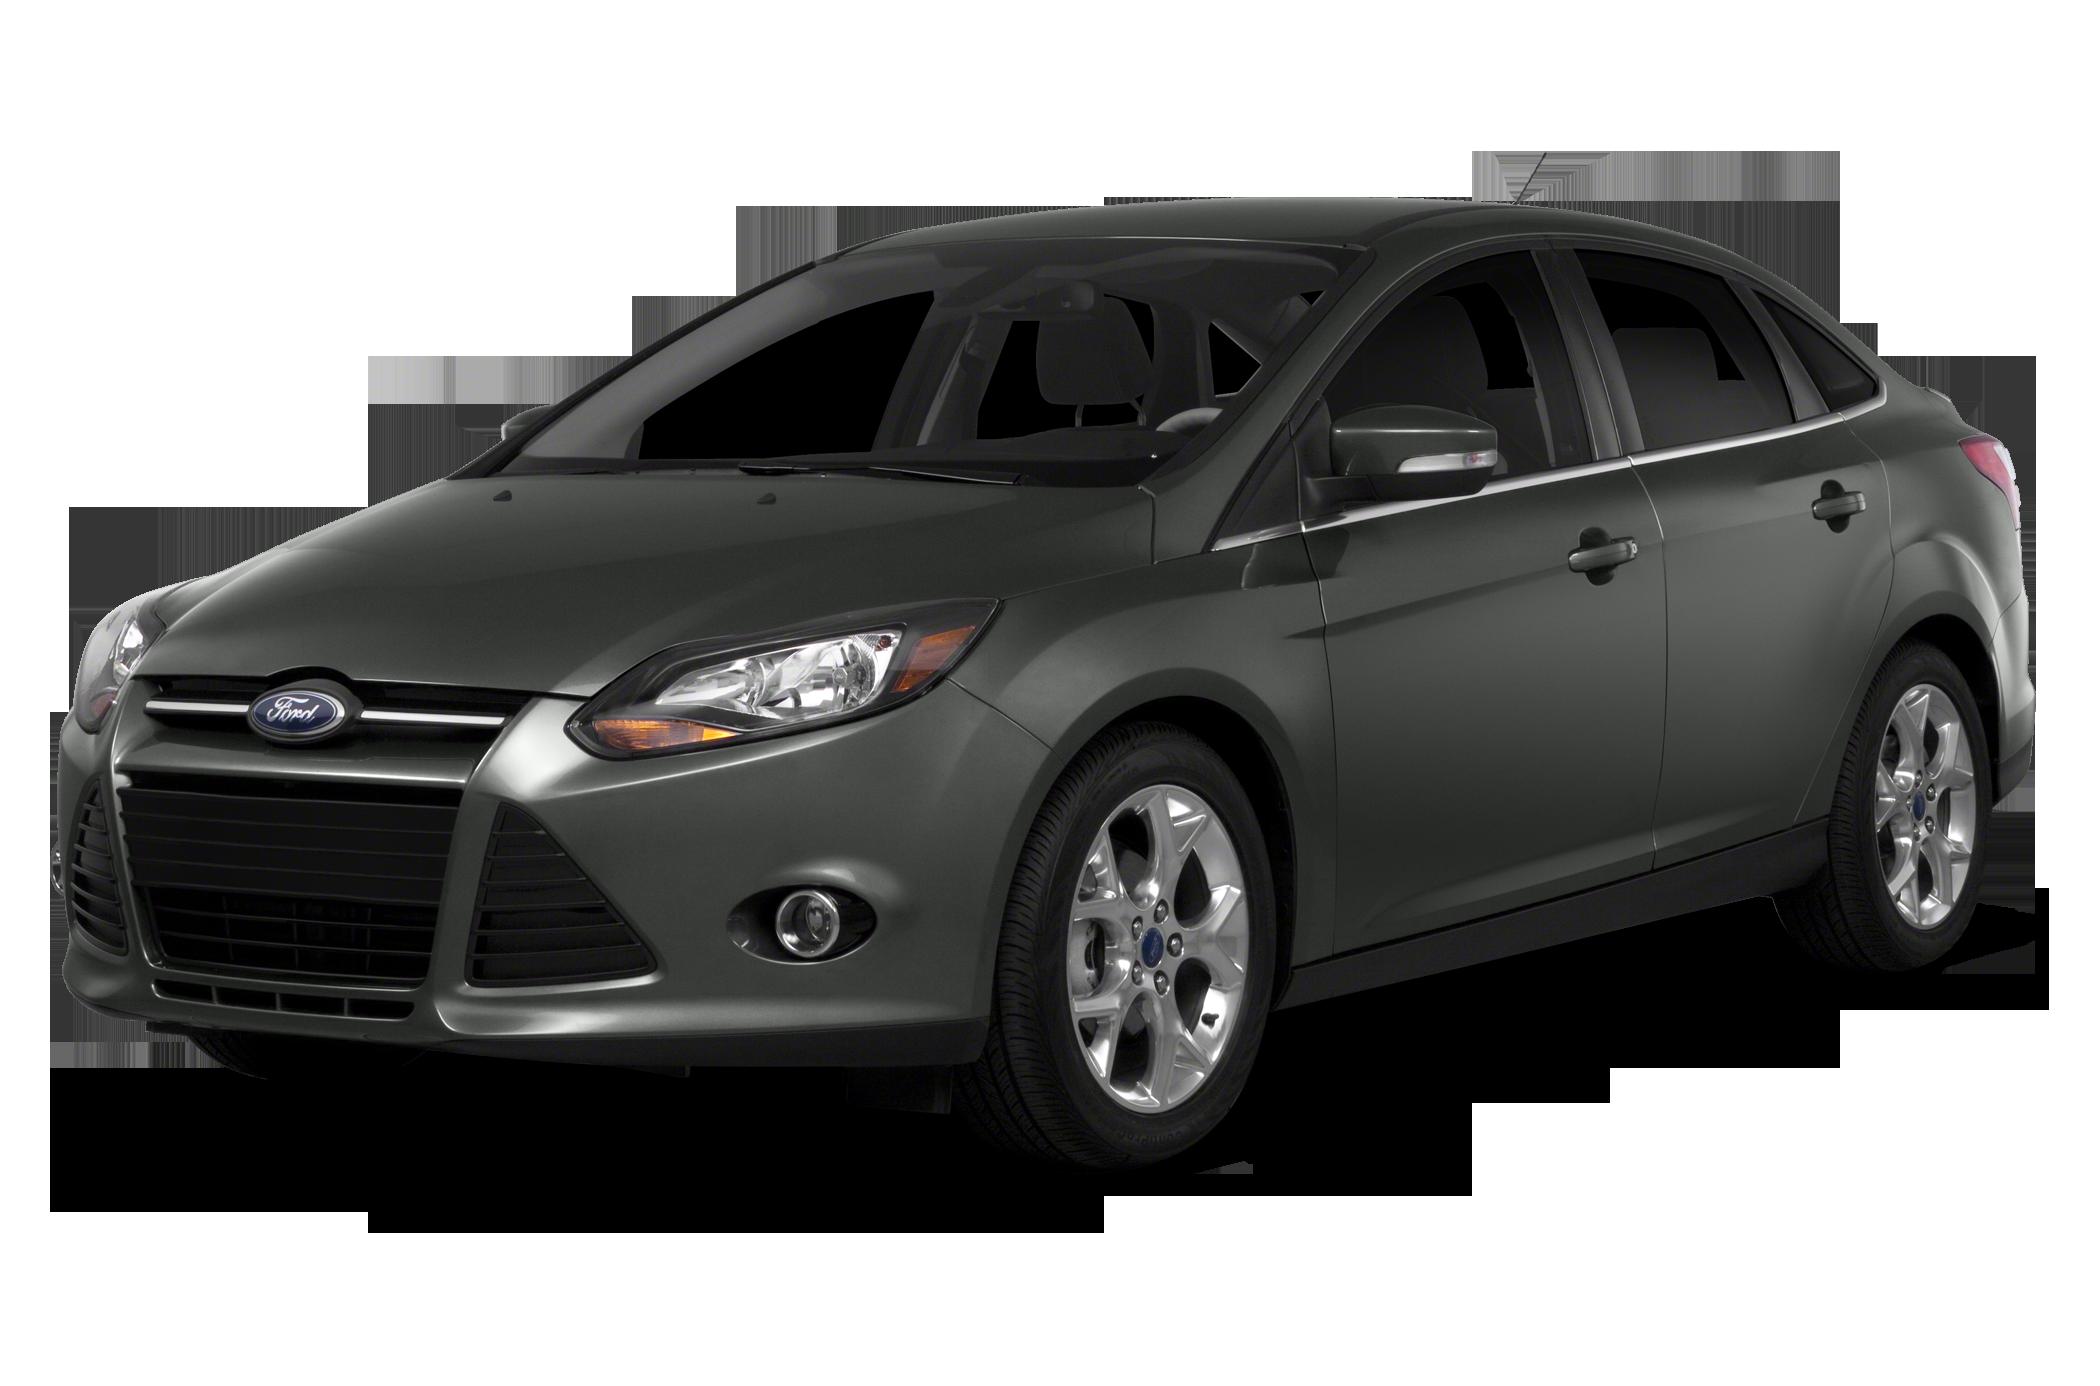 2014 Ford Focus Consumer Reviews